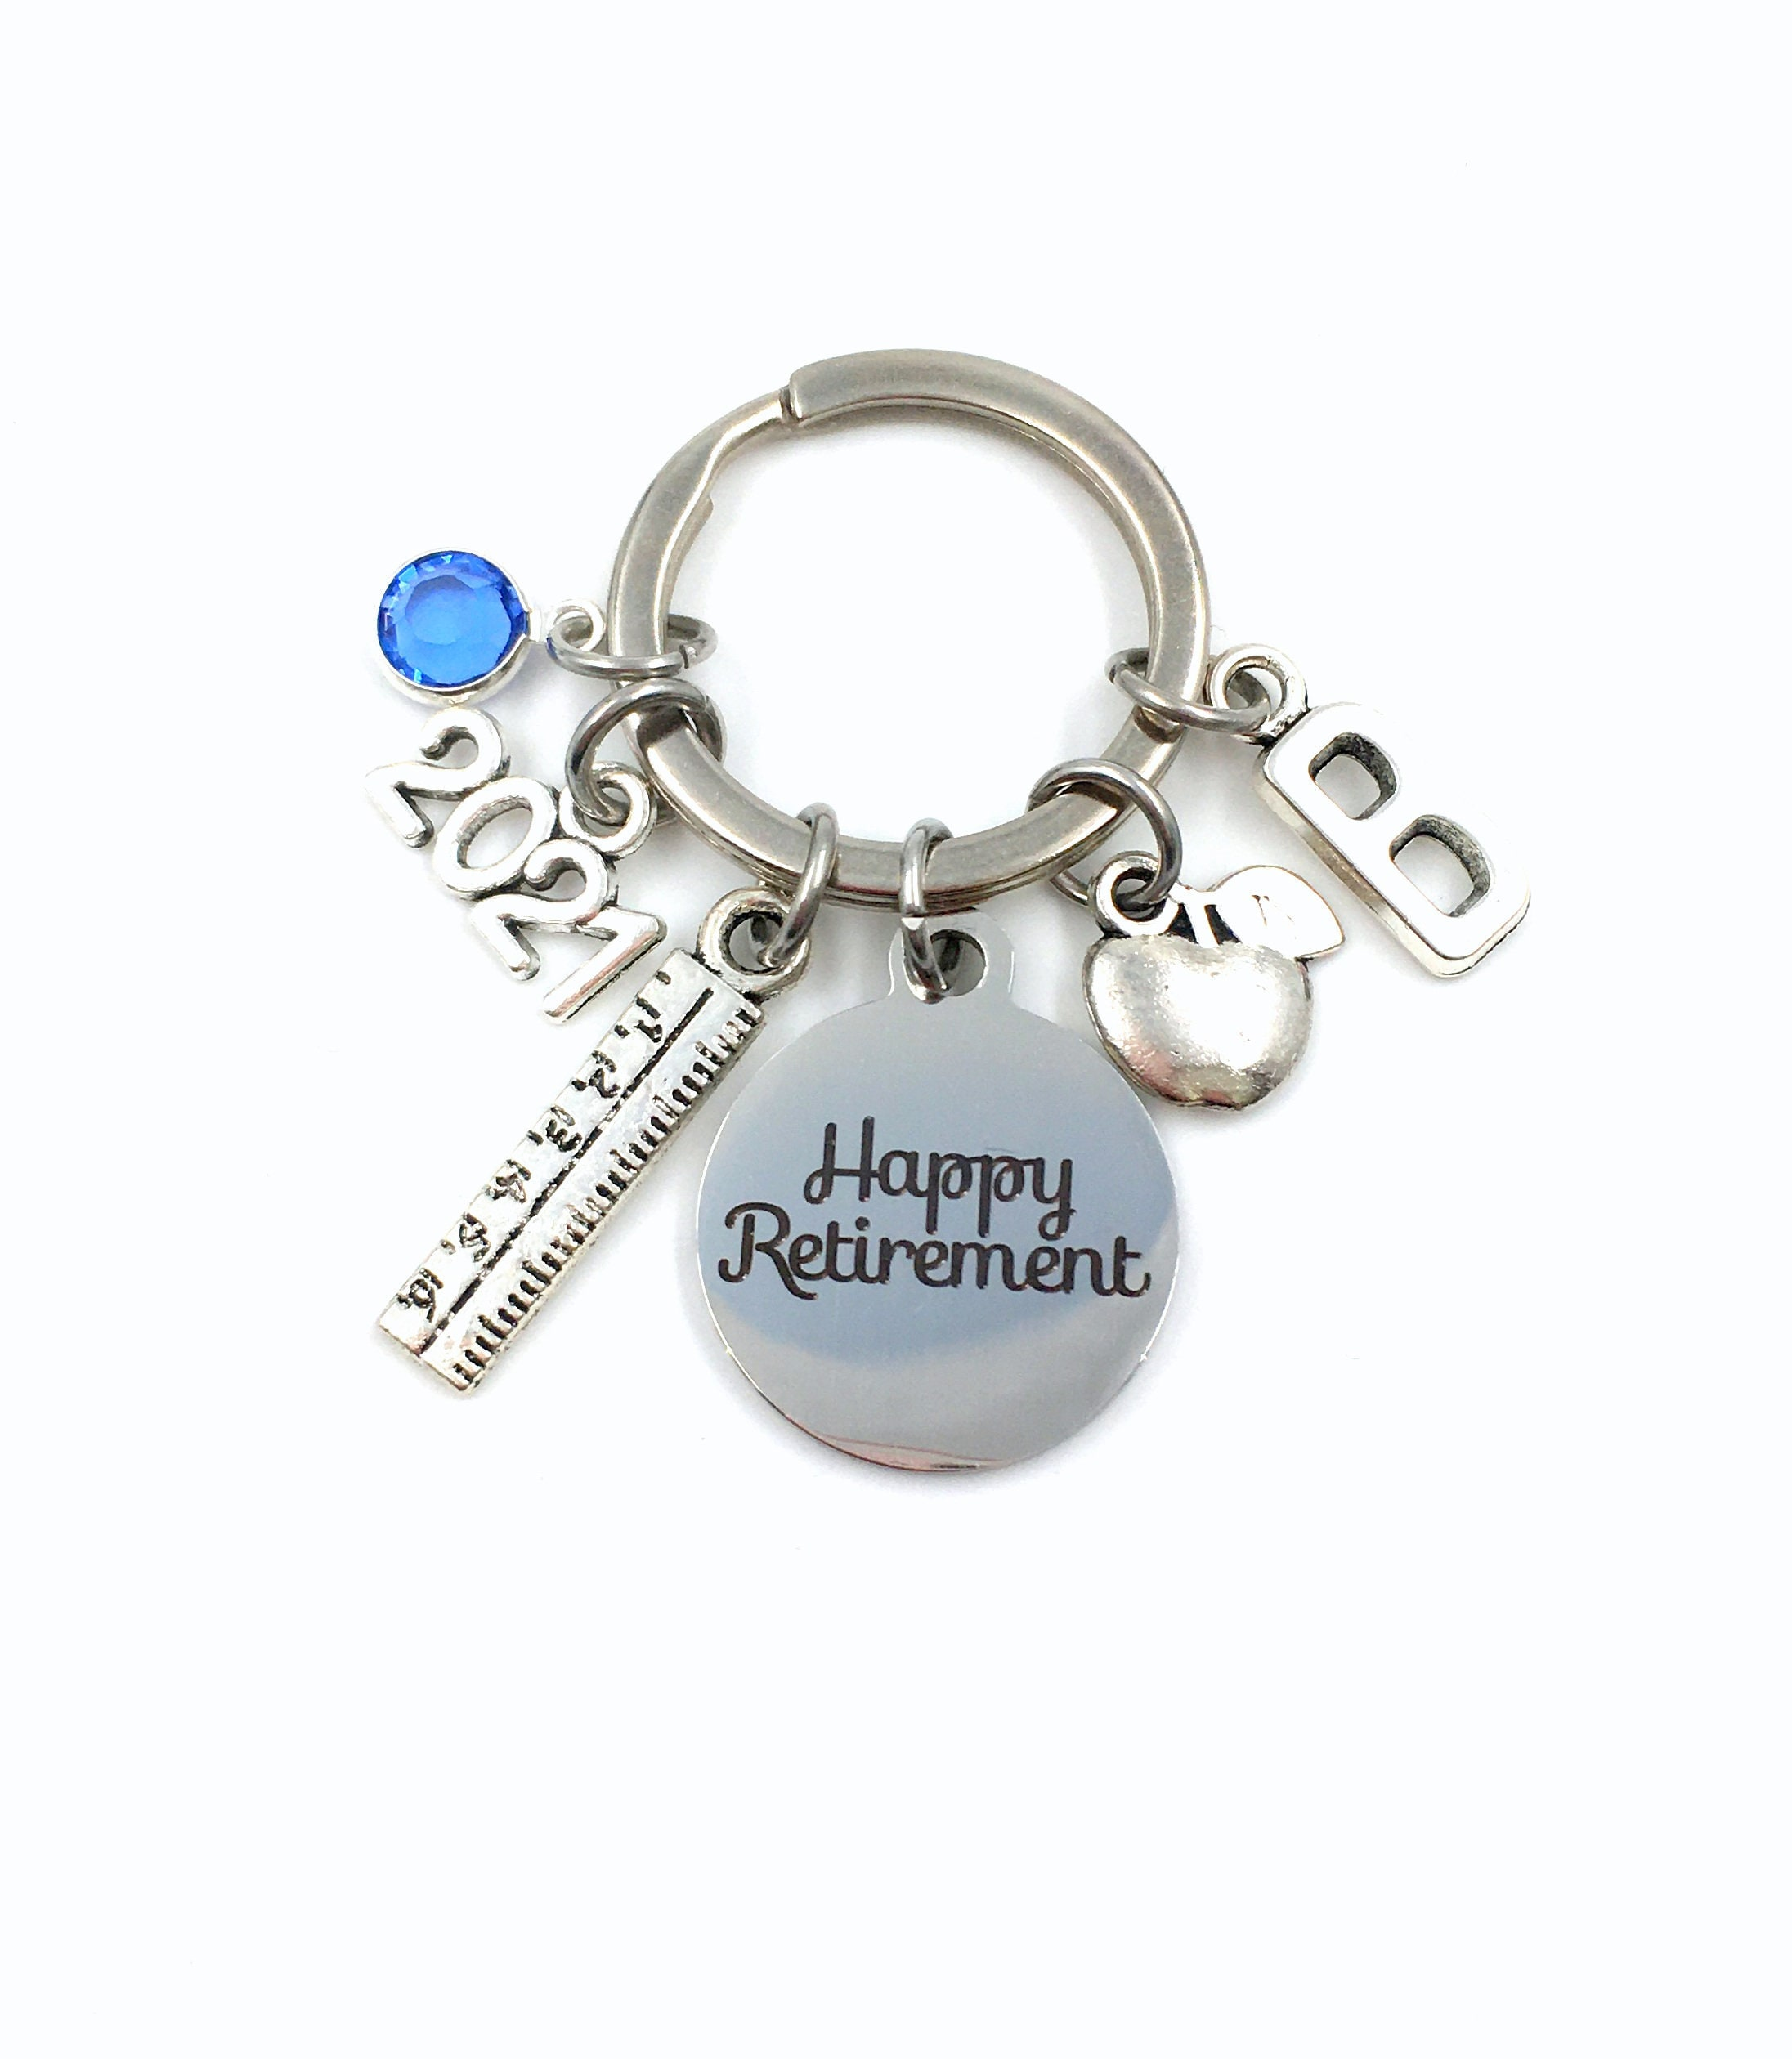 secretary assistant Software Design Key chain laptop present keyring business boss Retirement Gift for Computer Technician Keychain